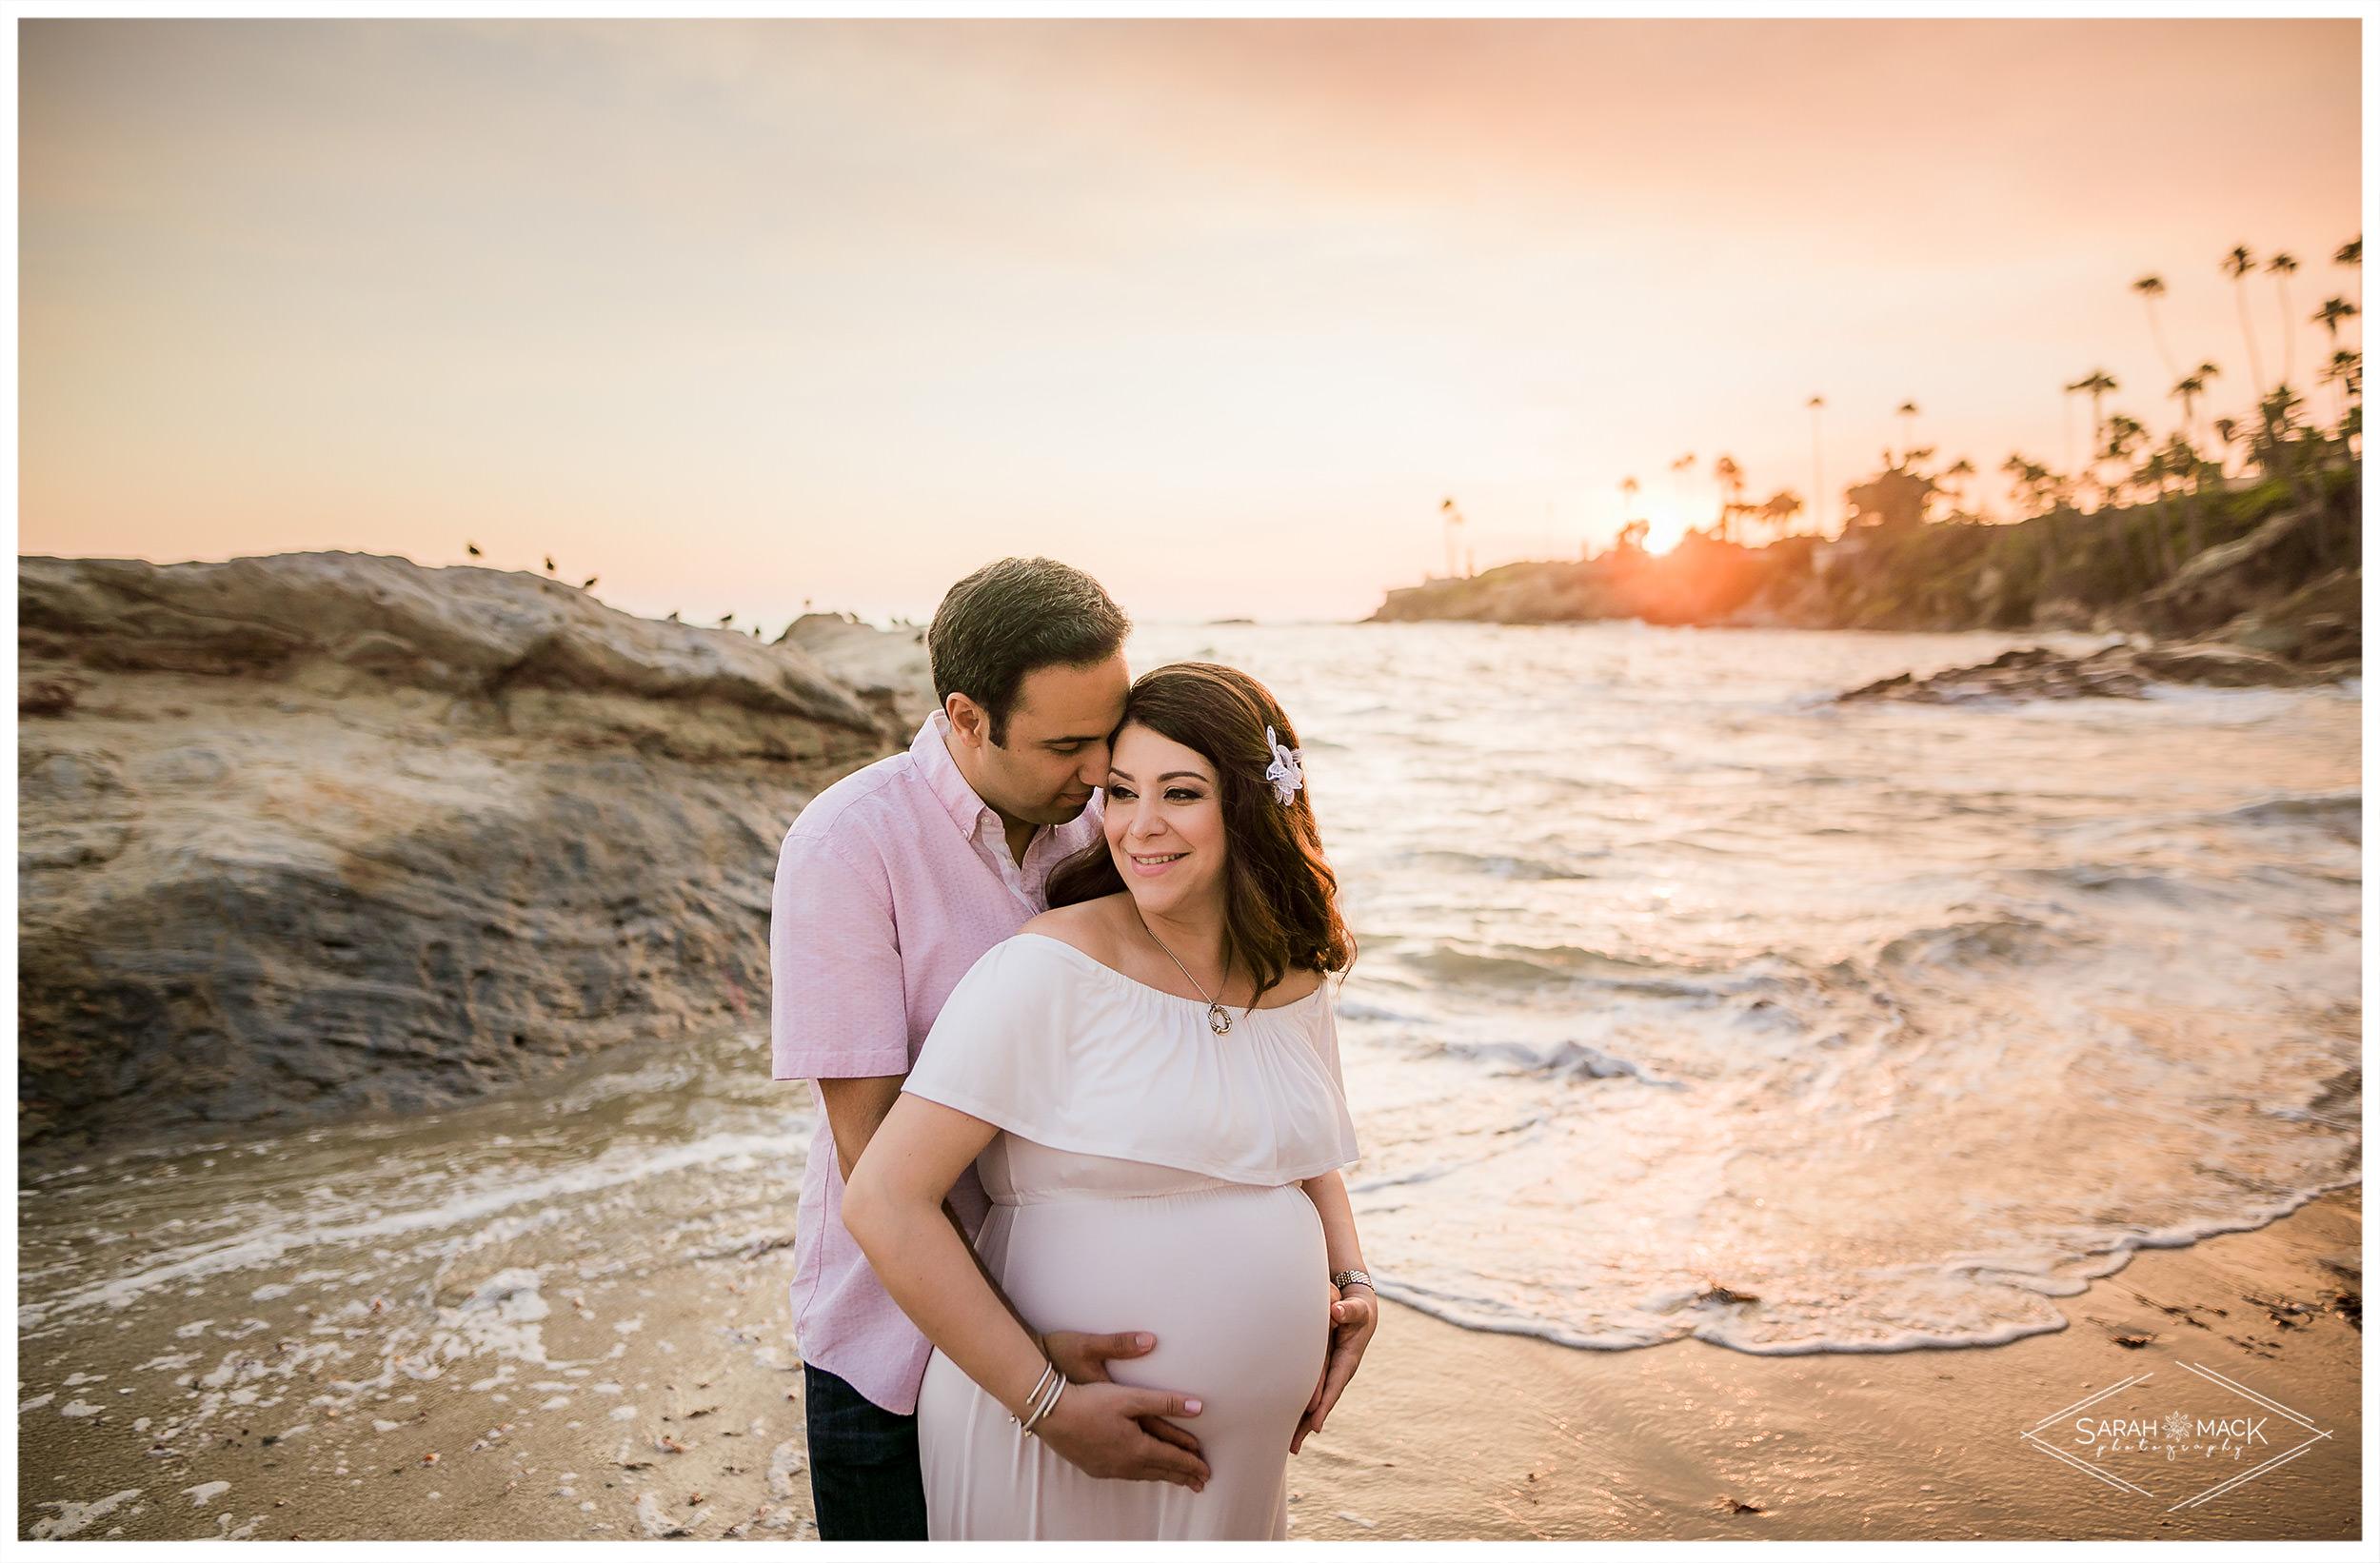 MA-Orange-County-Maternity-Photography-6.jpg